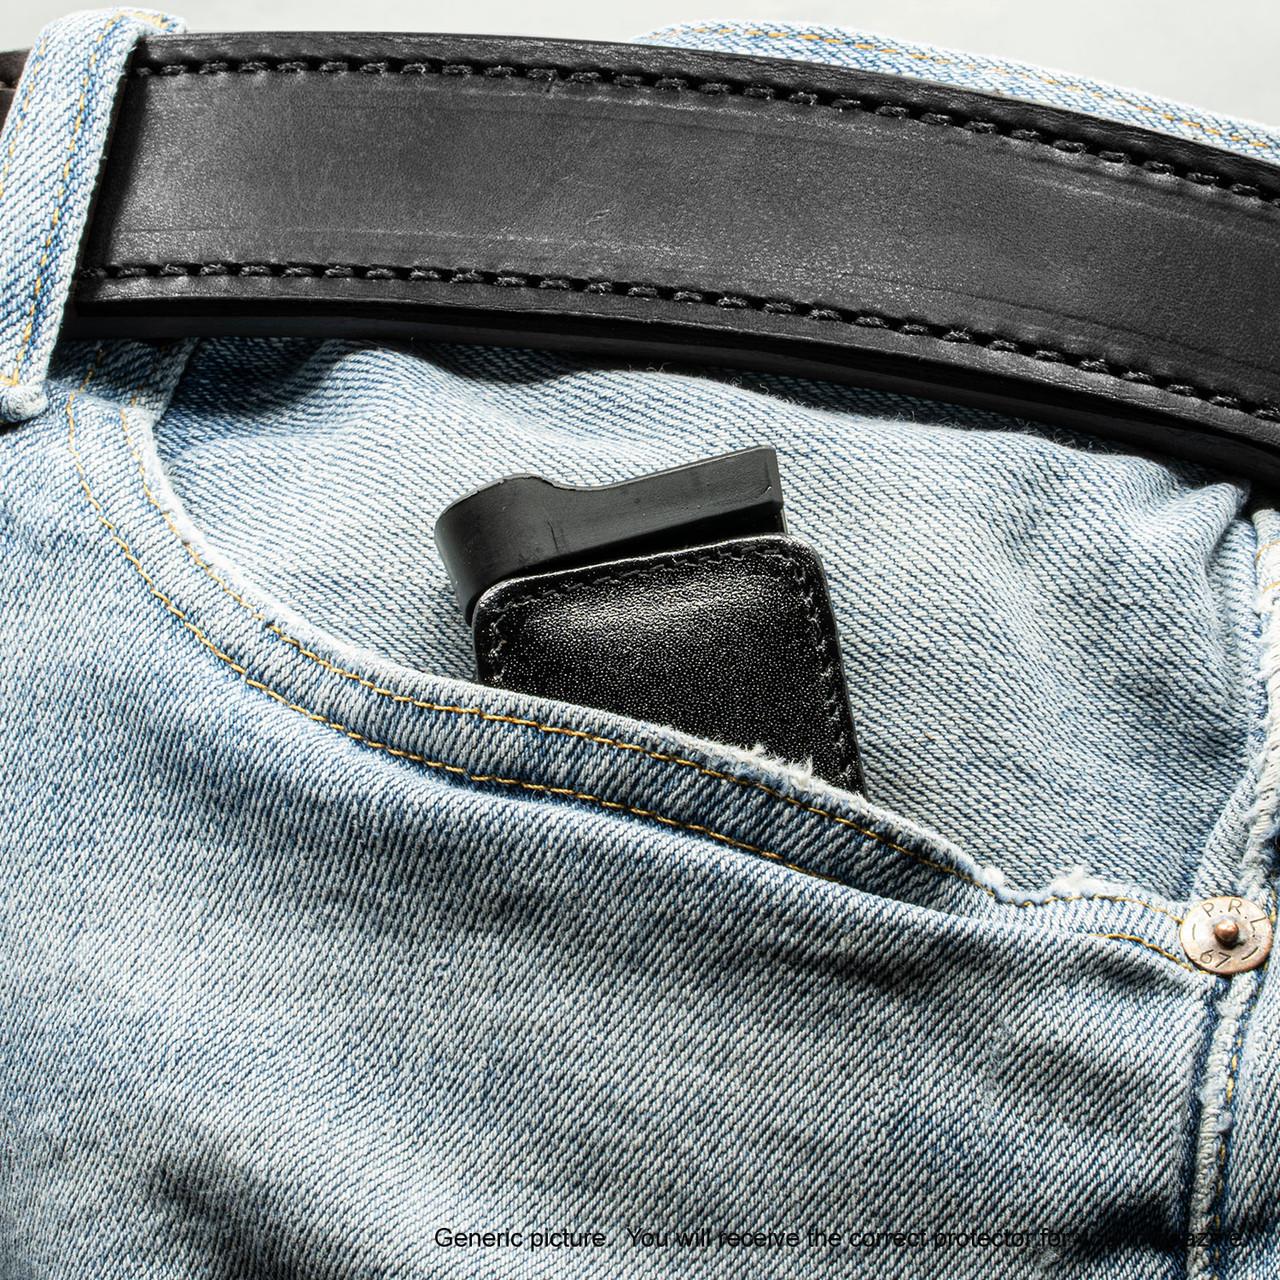 Honor Guard Black Leather Magazine Pocket Protector